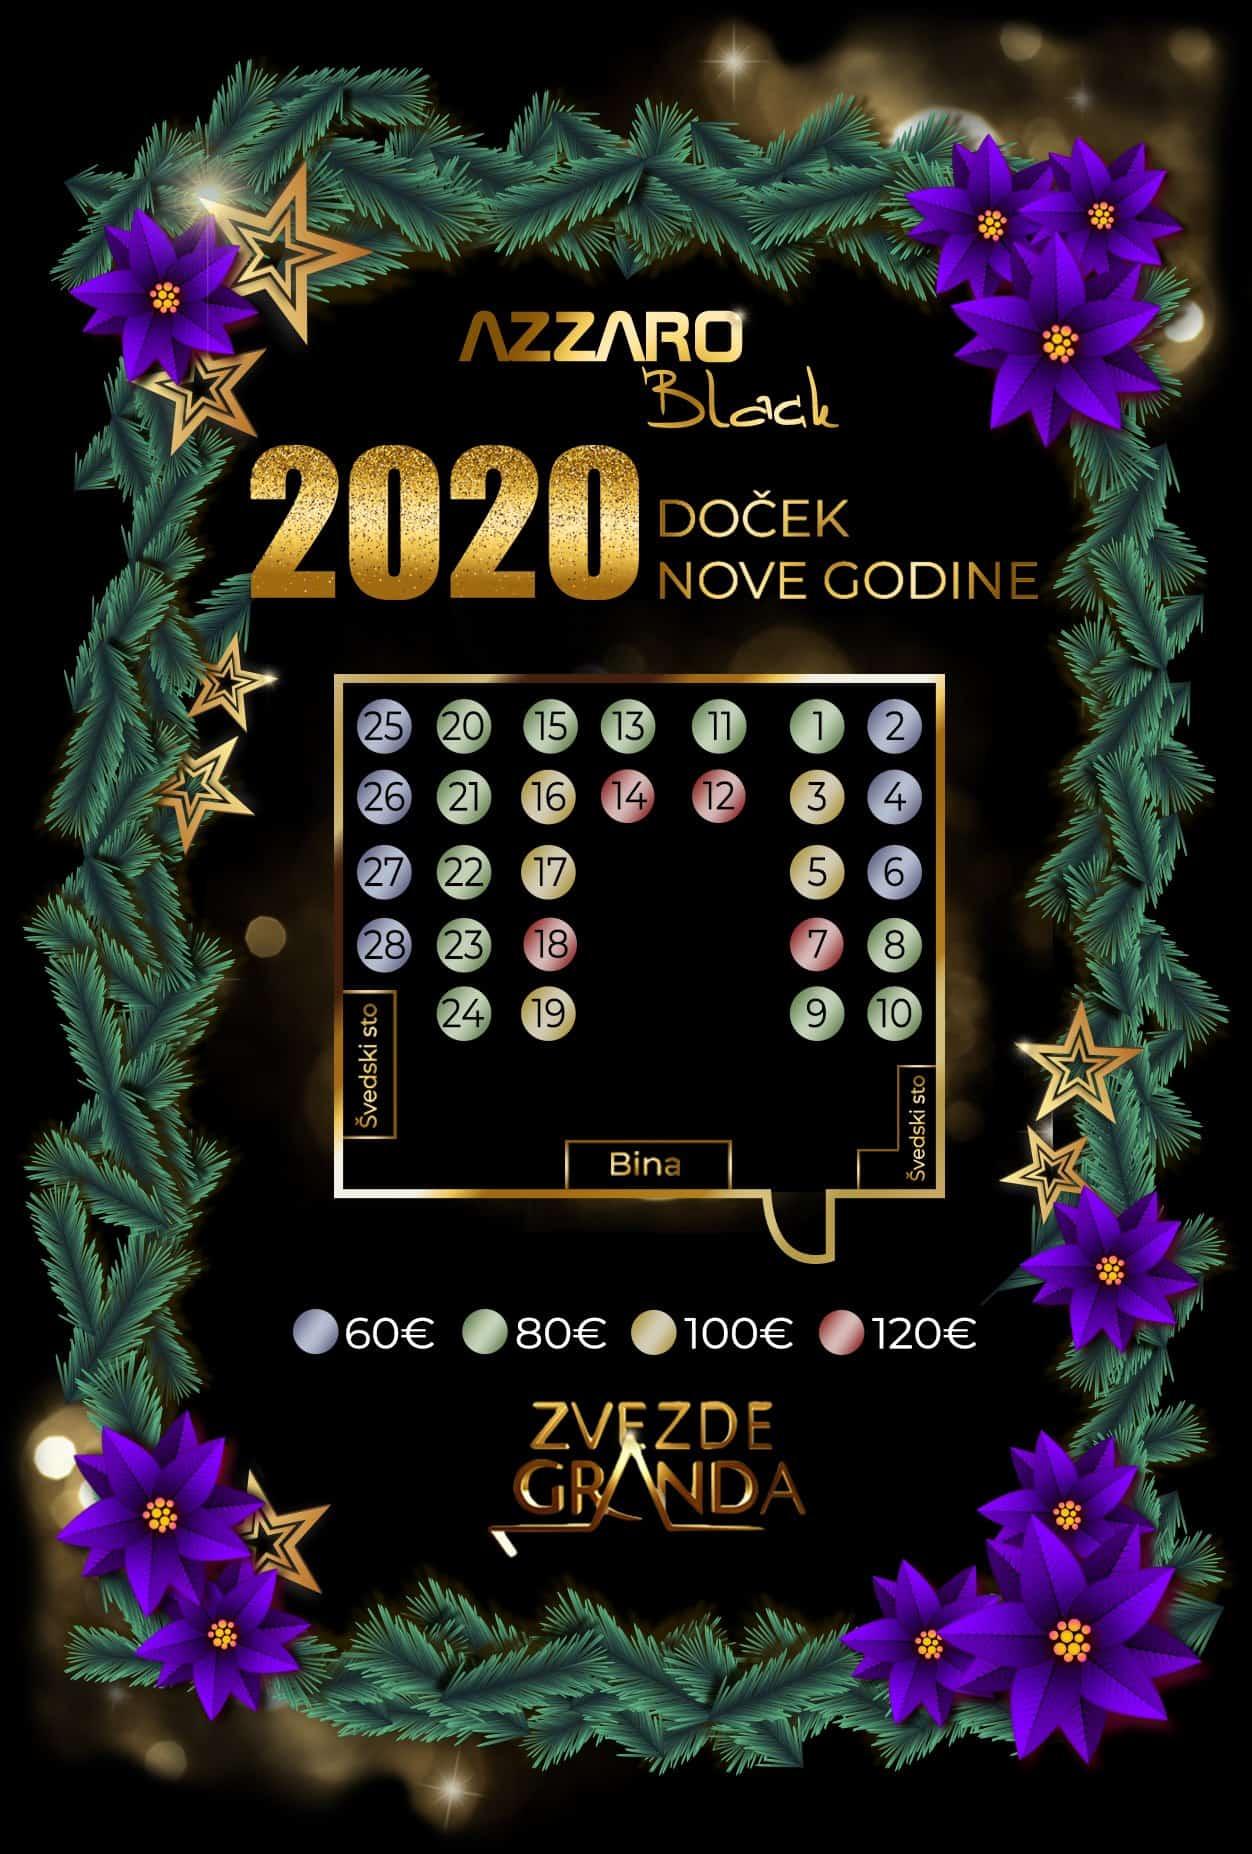 Docek Nove godine 2020 Beograd Restoran Jezero by Azzaro Ada Ciganlija mapa 2